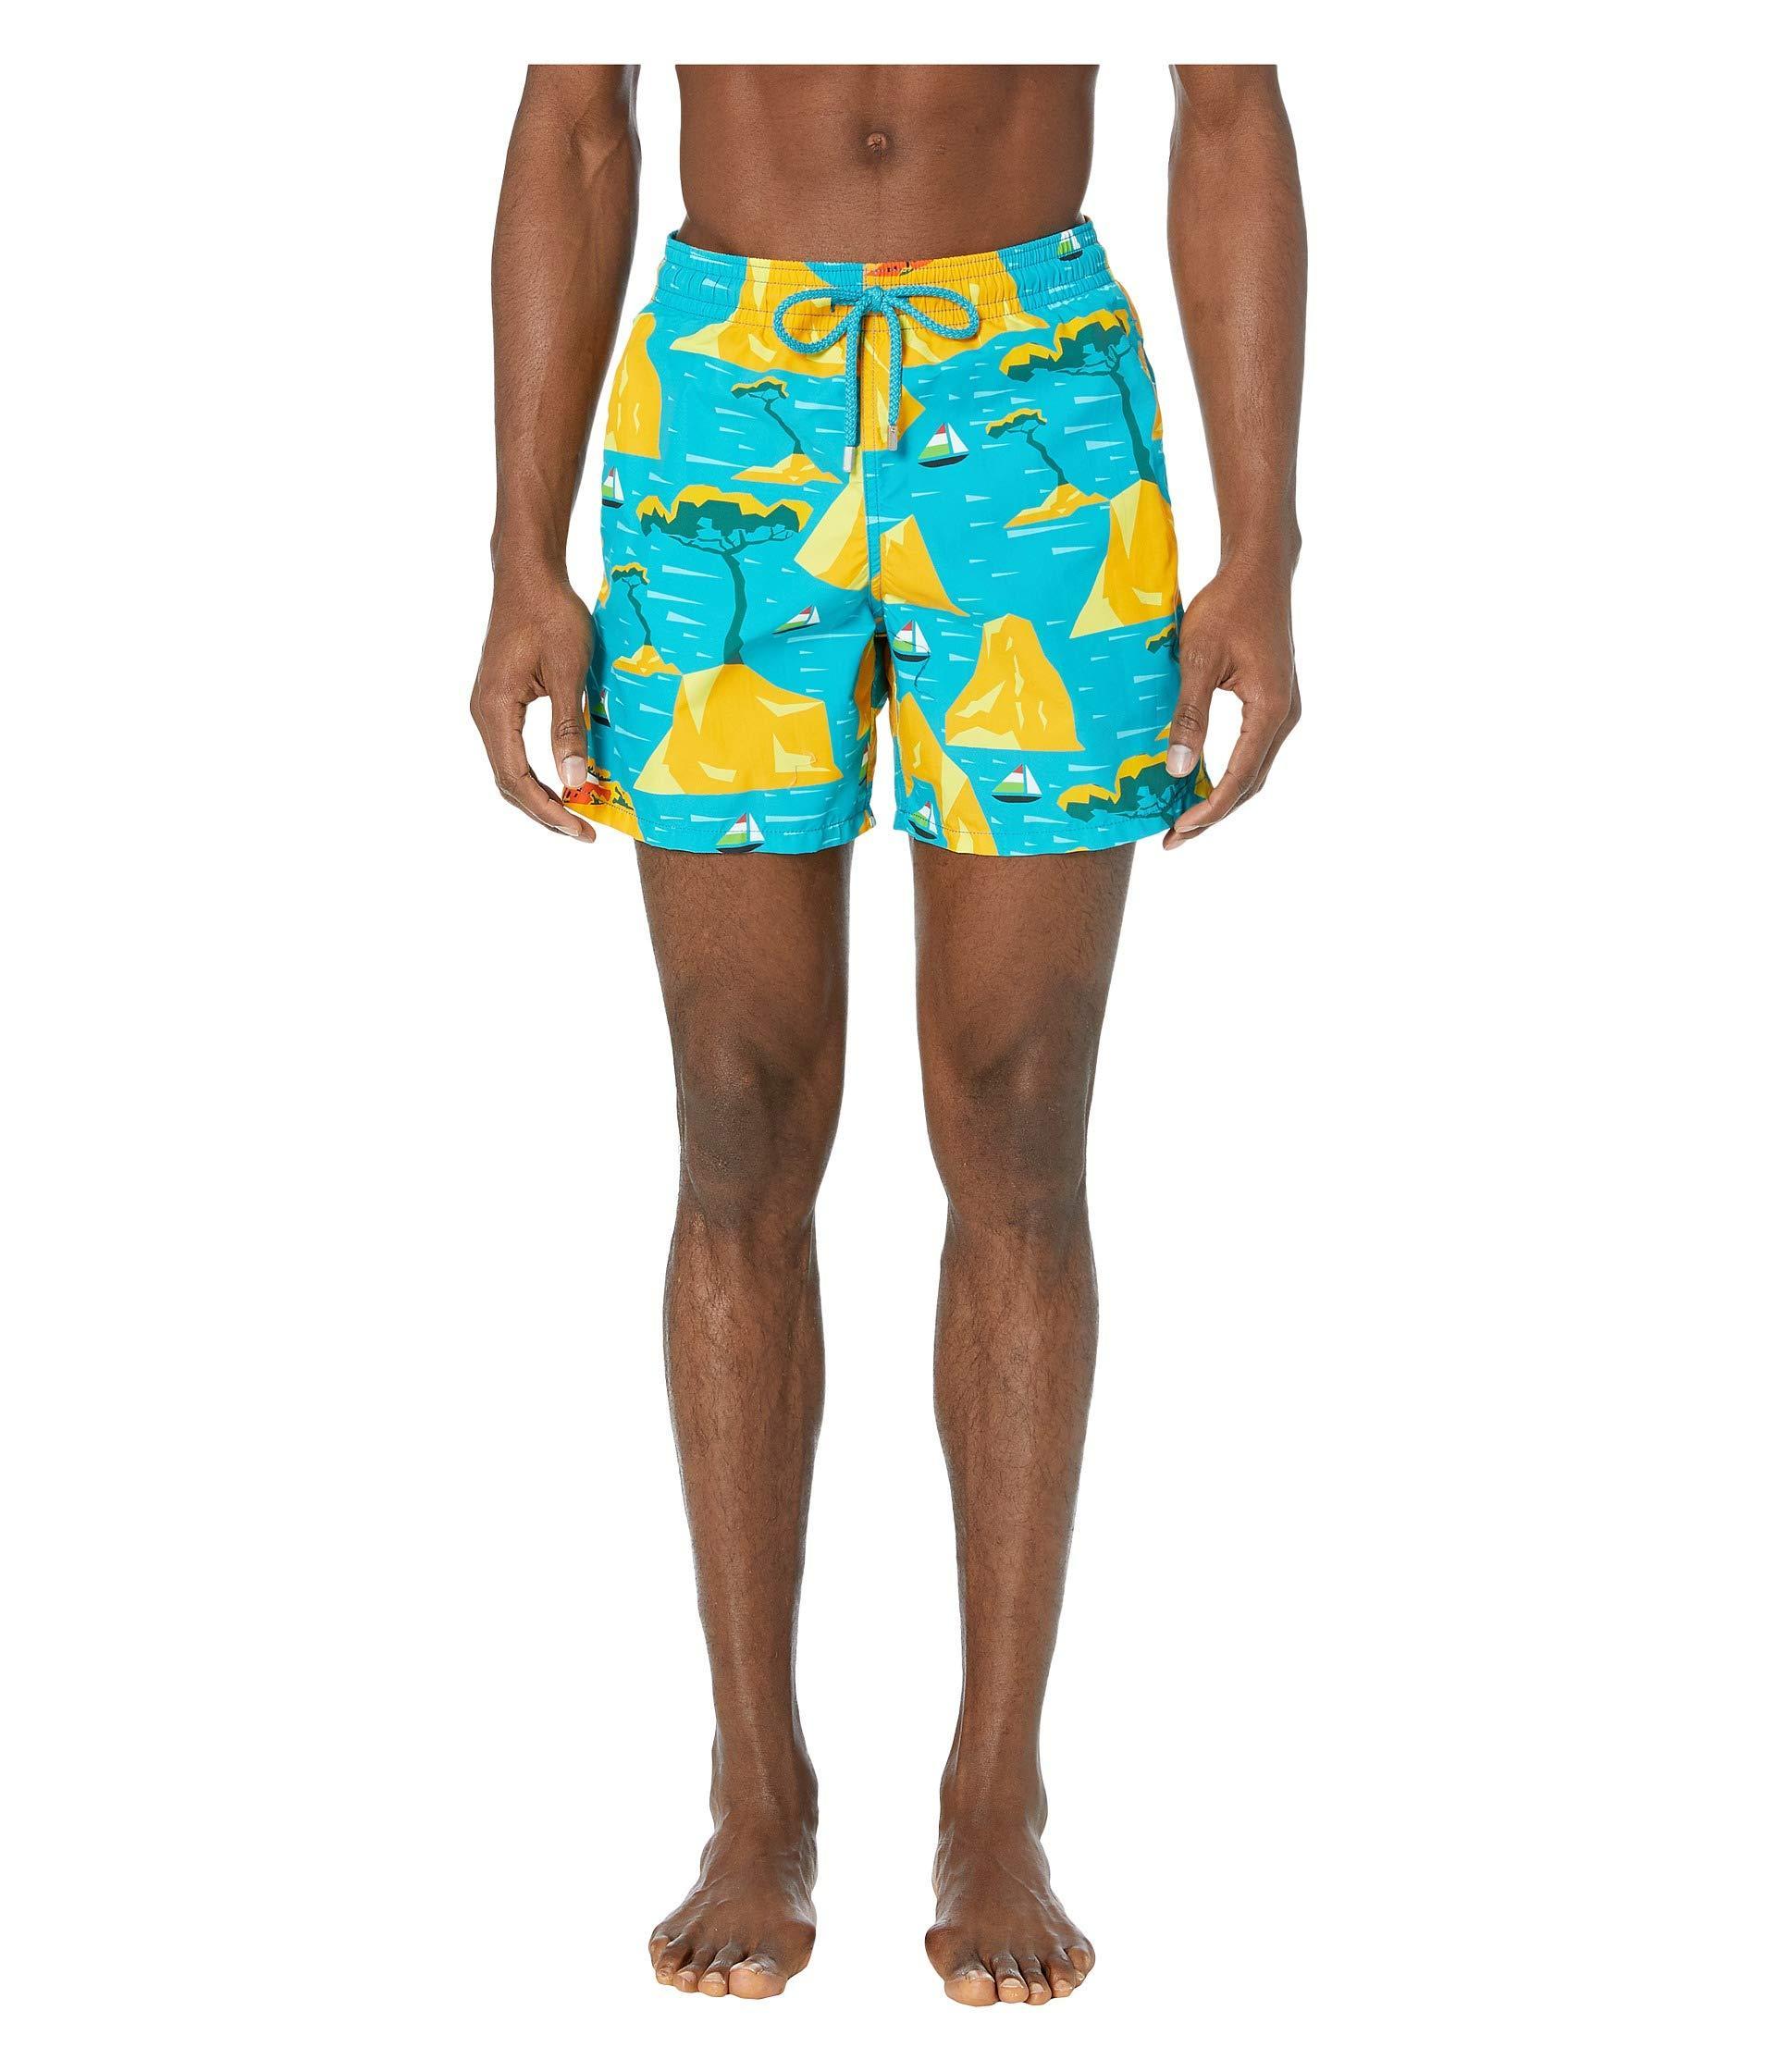 ee011b80e3 Lyst - Vilebrequin Capri Moorea Swim Trunks (bahama Blue) Men's ...